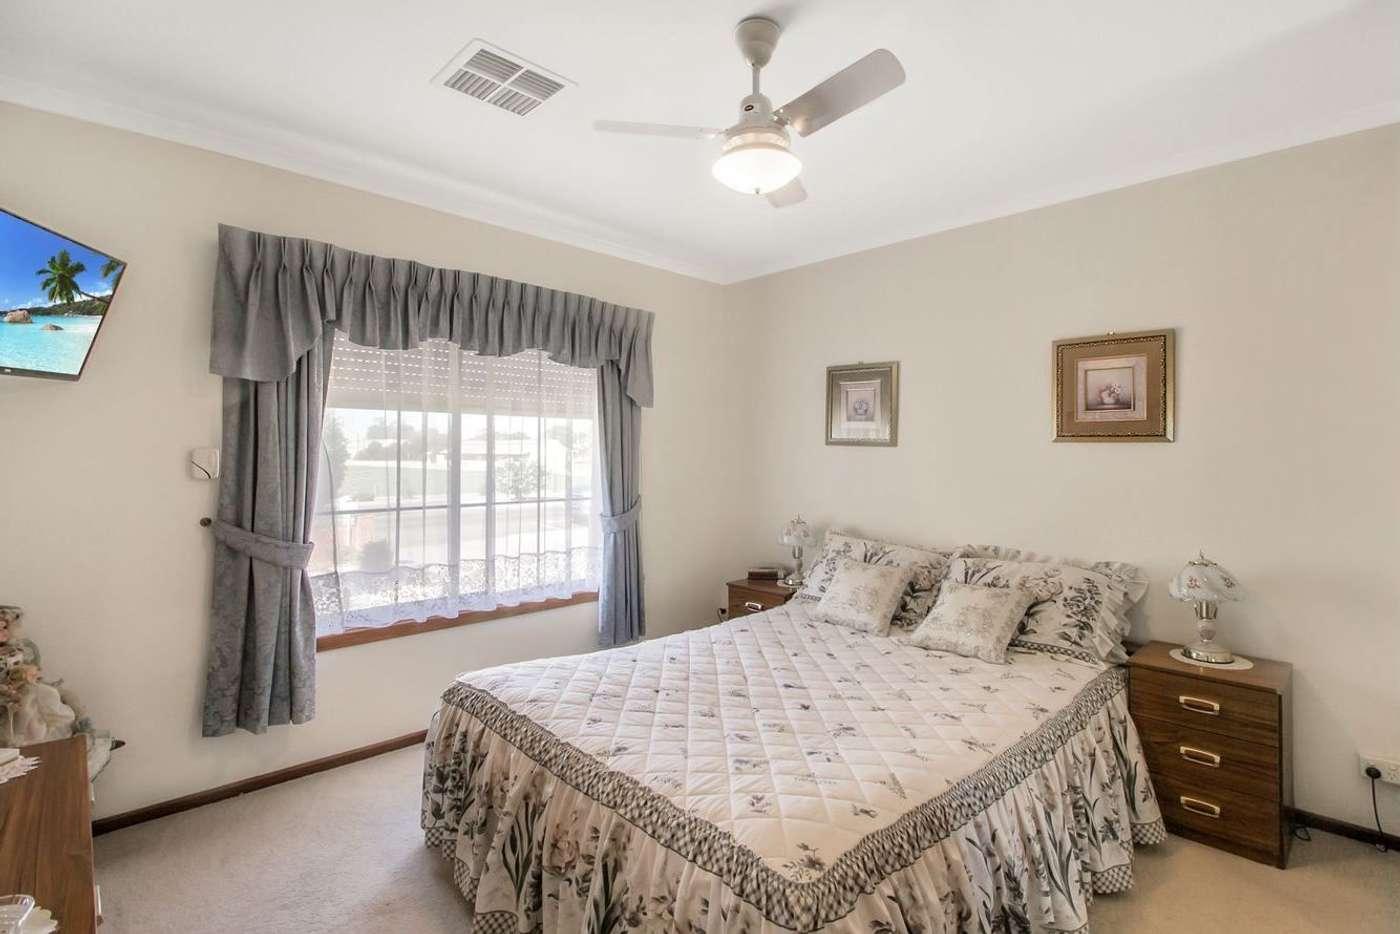 Sixth view of Homely house listing, 3/13 Scott Avenue, Barmera SA 5345